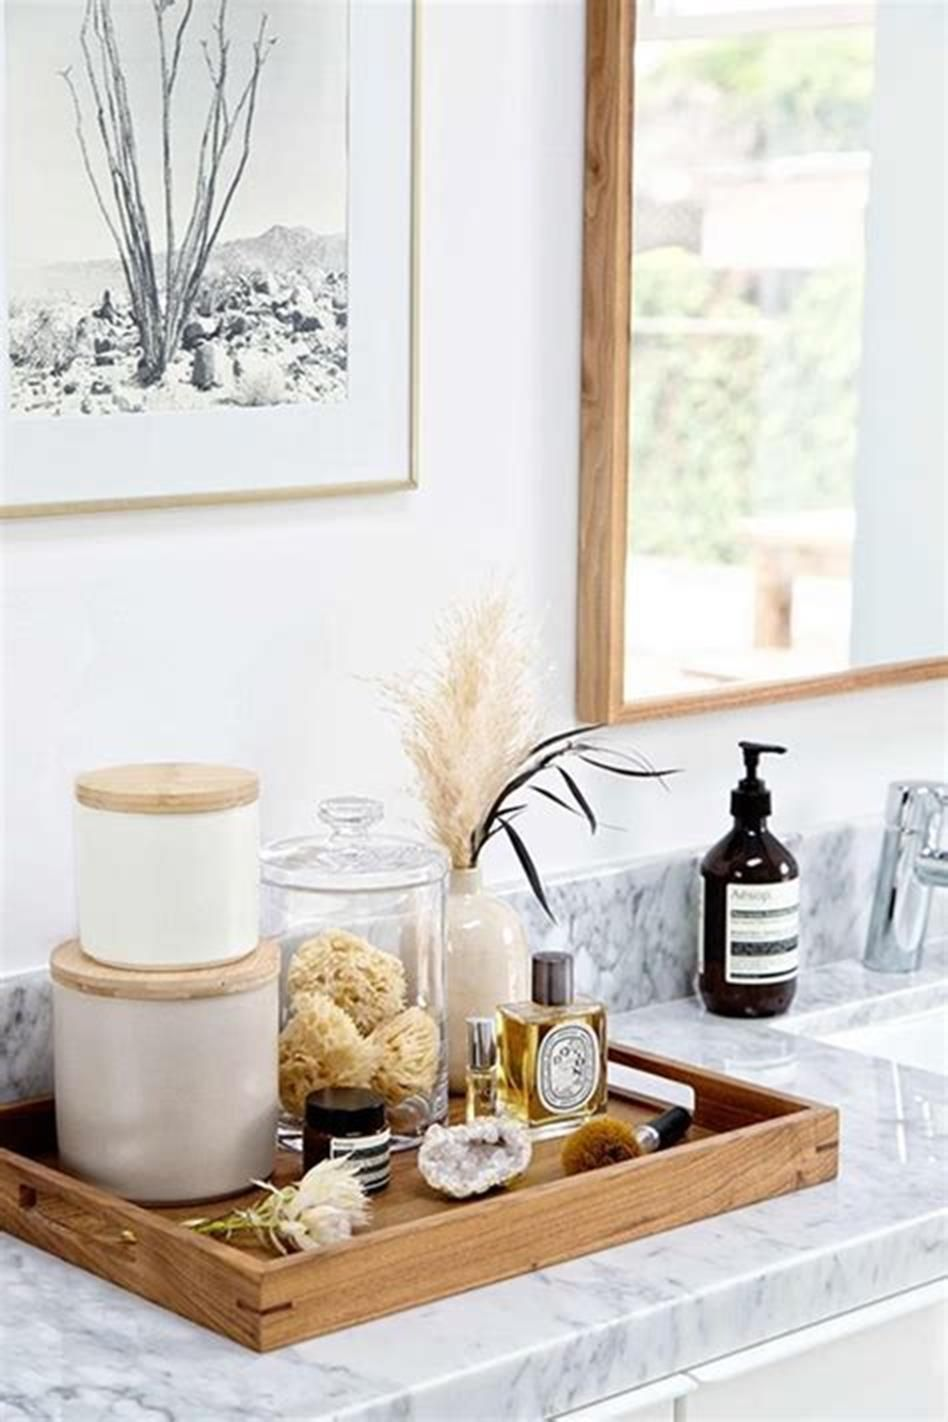 40 Beautiful Bathroom Vanity Tray Decor Ideas 8 Bathroom Vanity Tray Vanity Tray Decor Modern Bathroom Organizers